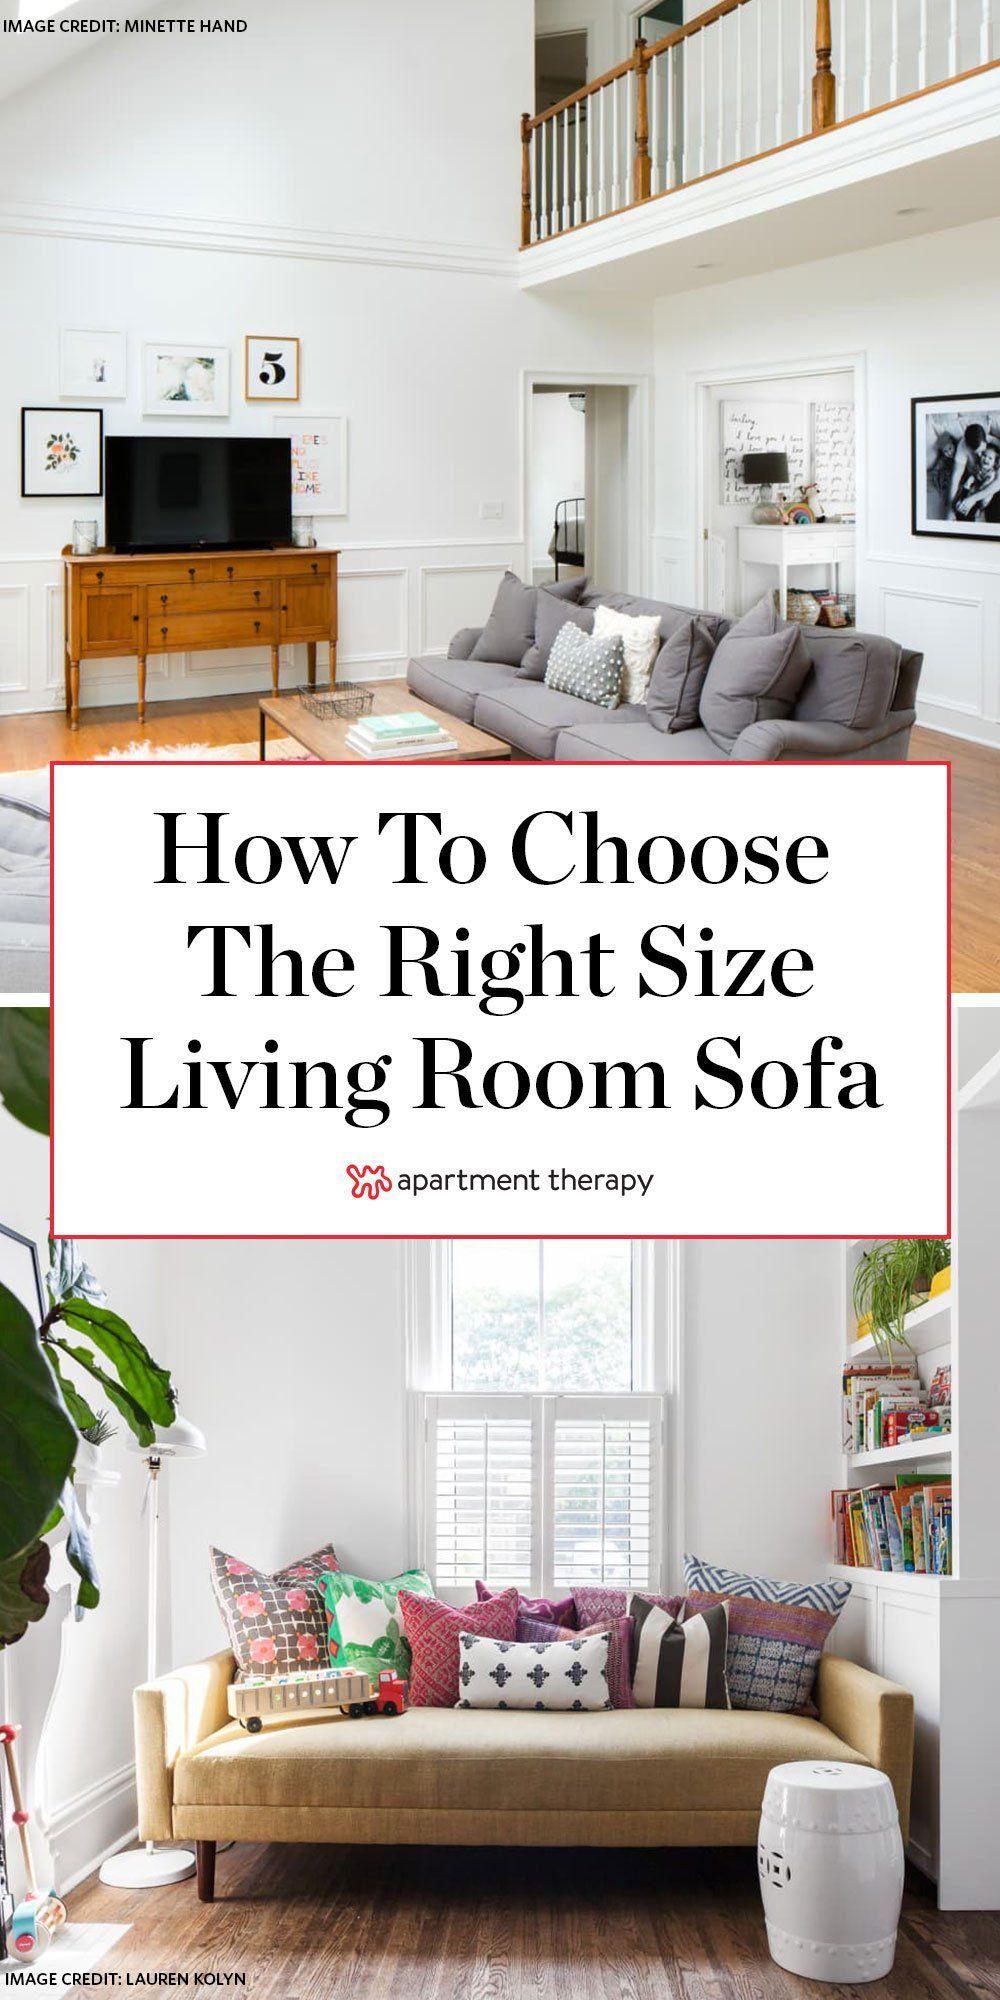 Living Room Sofa